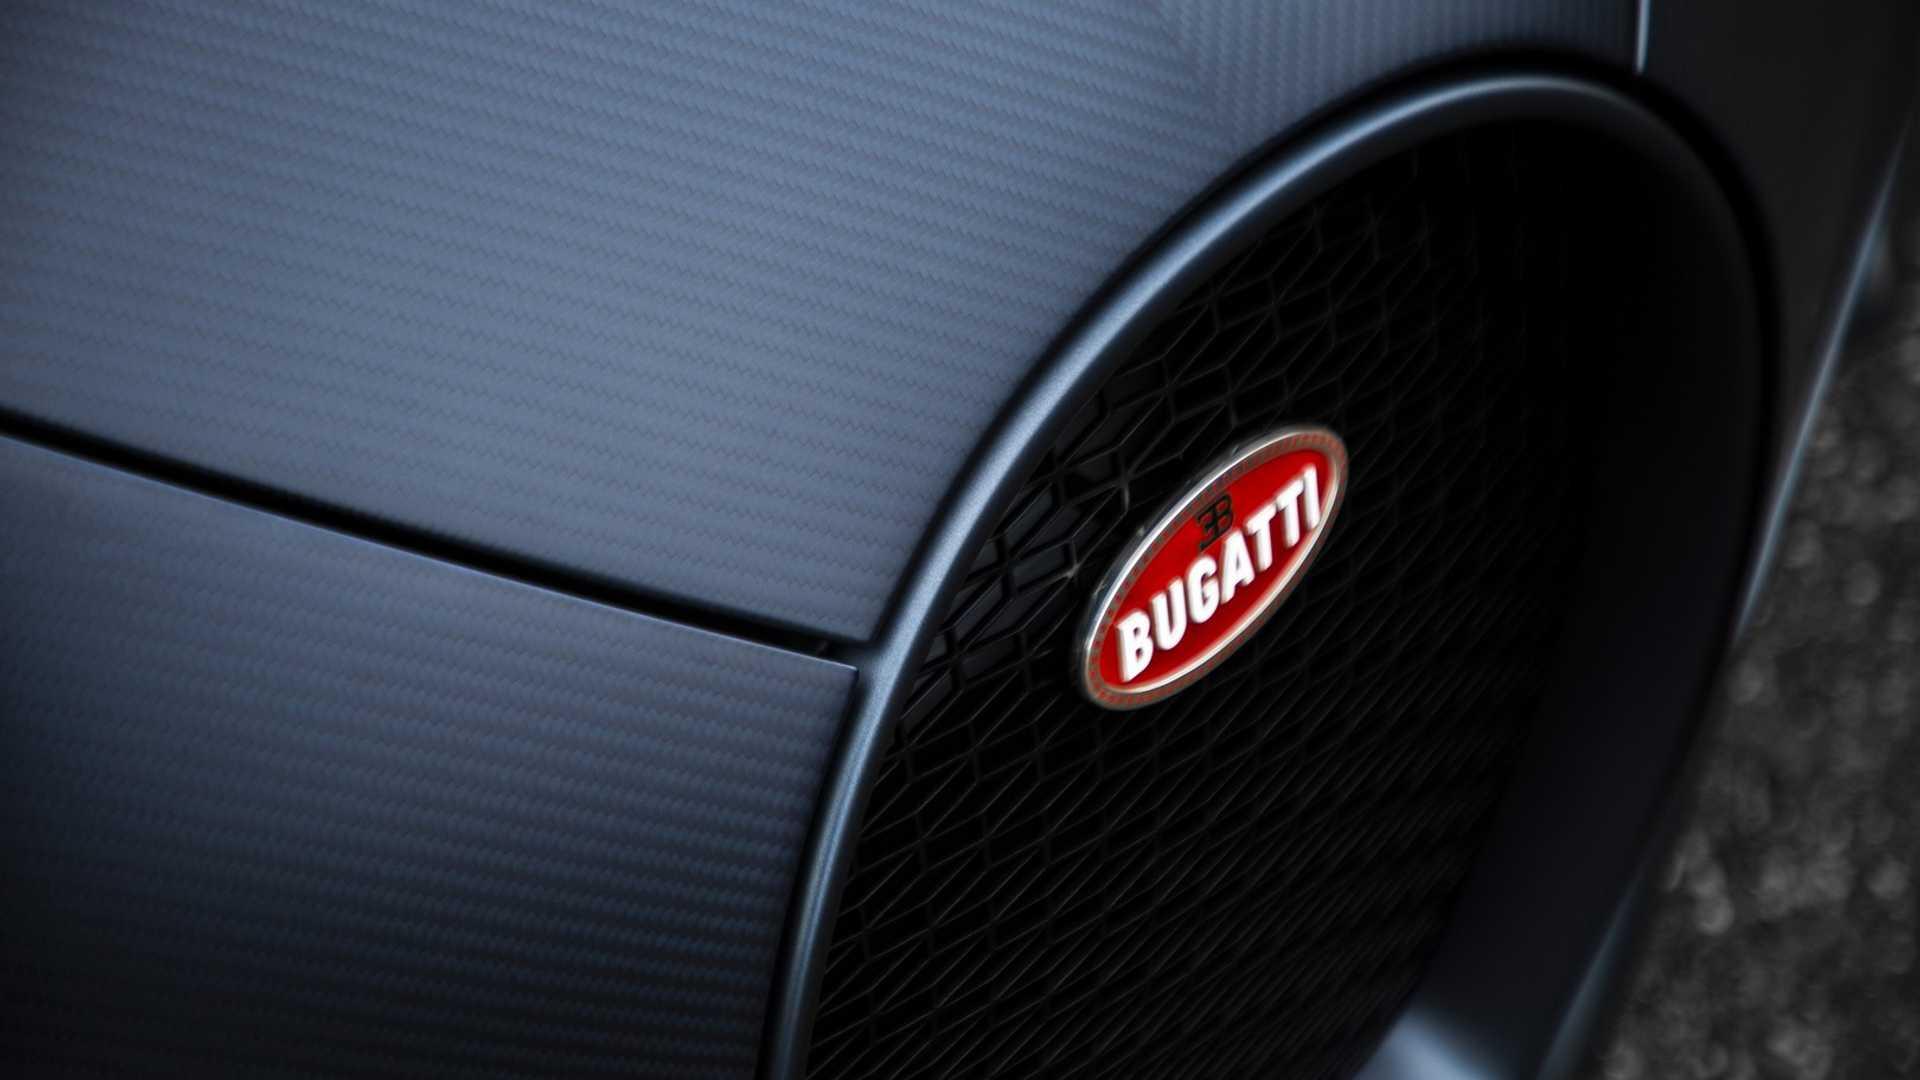 Bugatti Chiron Sport Quot 110 Ans Bugatti Quot Limited To 20 Units